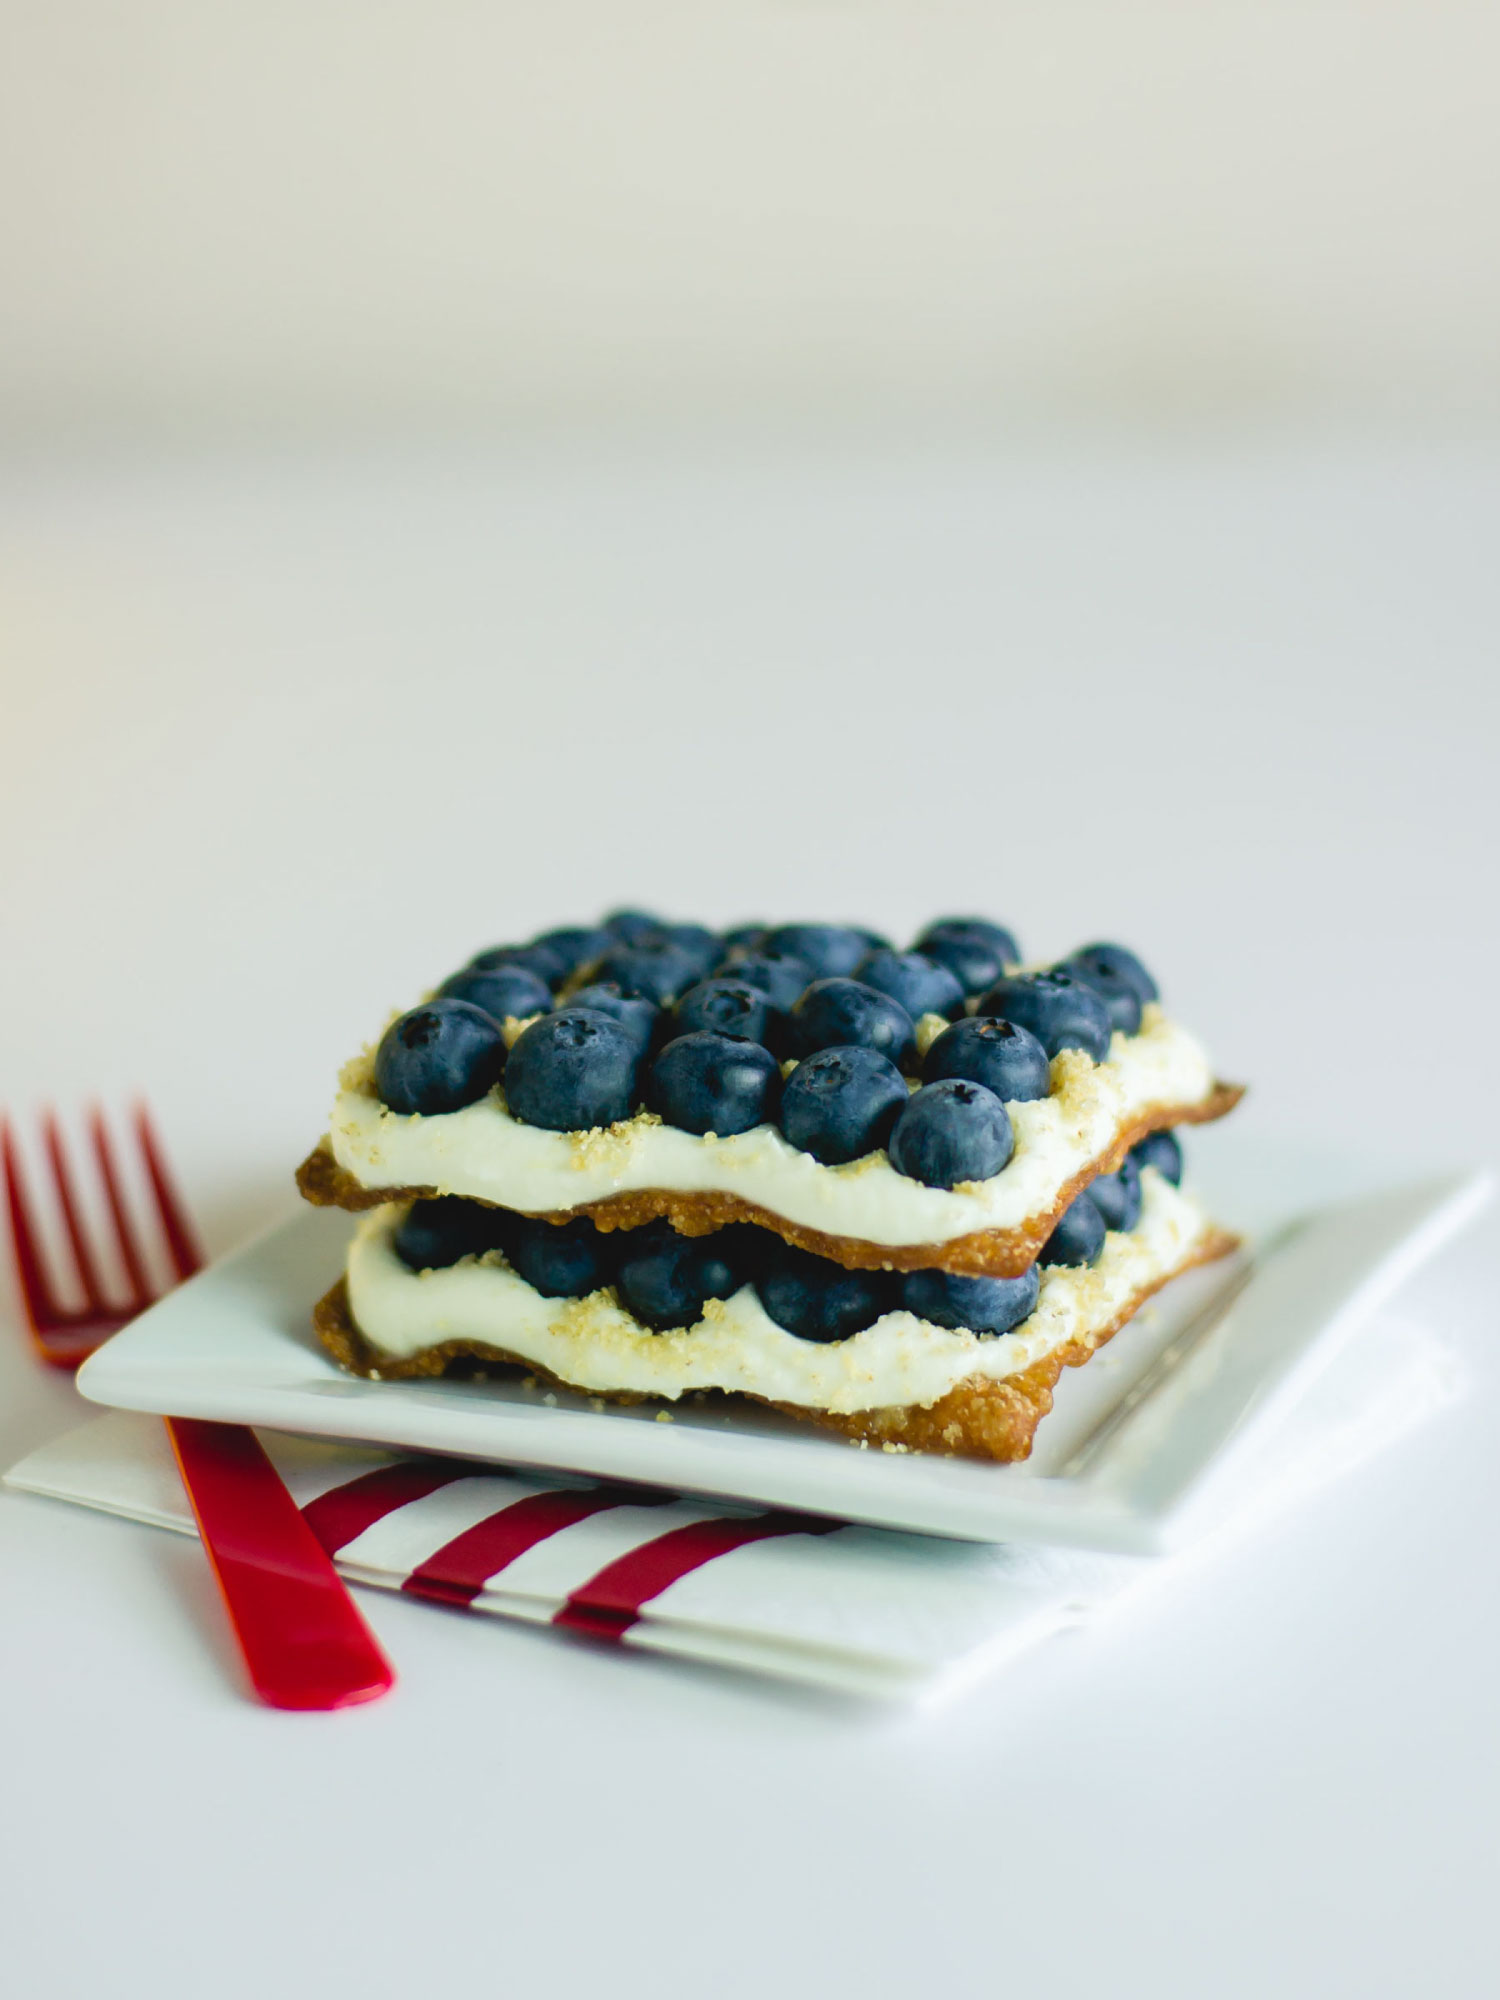 Blueberry Cheesecake Napoleon by Sam Henderson of Today's Nest for HGTVGardens.